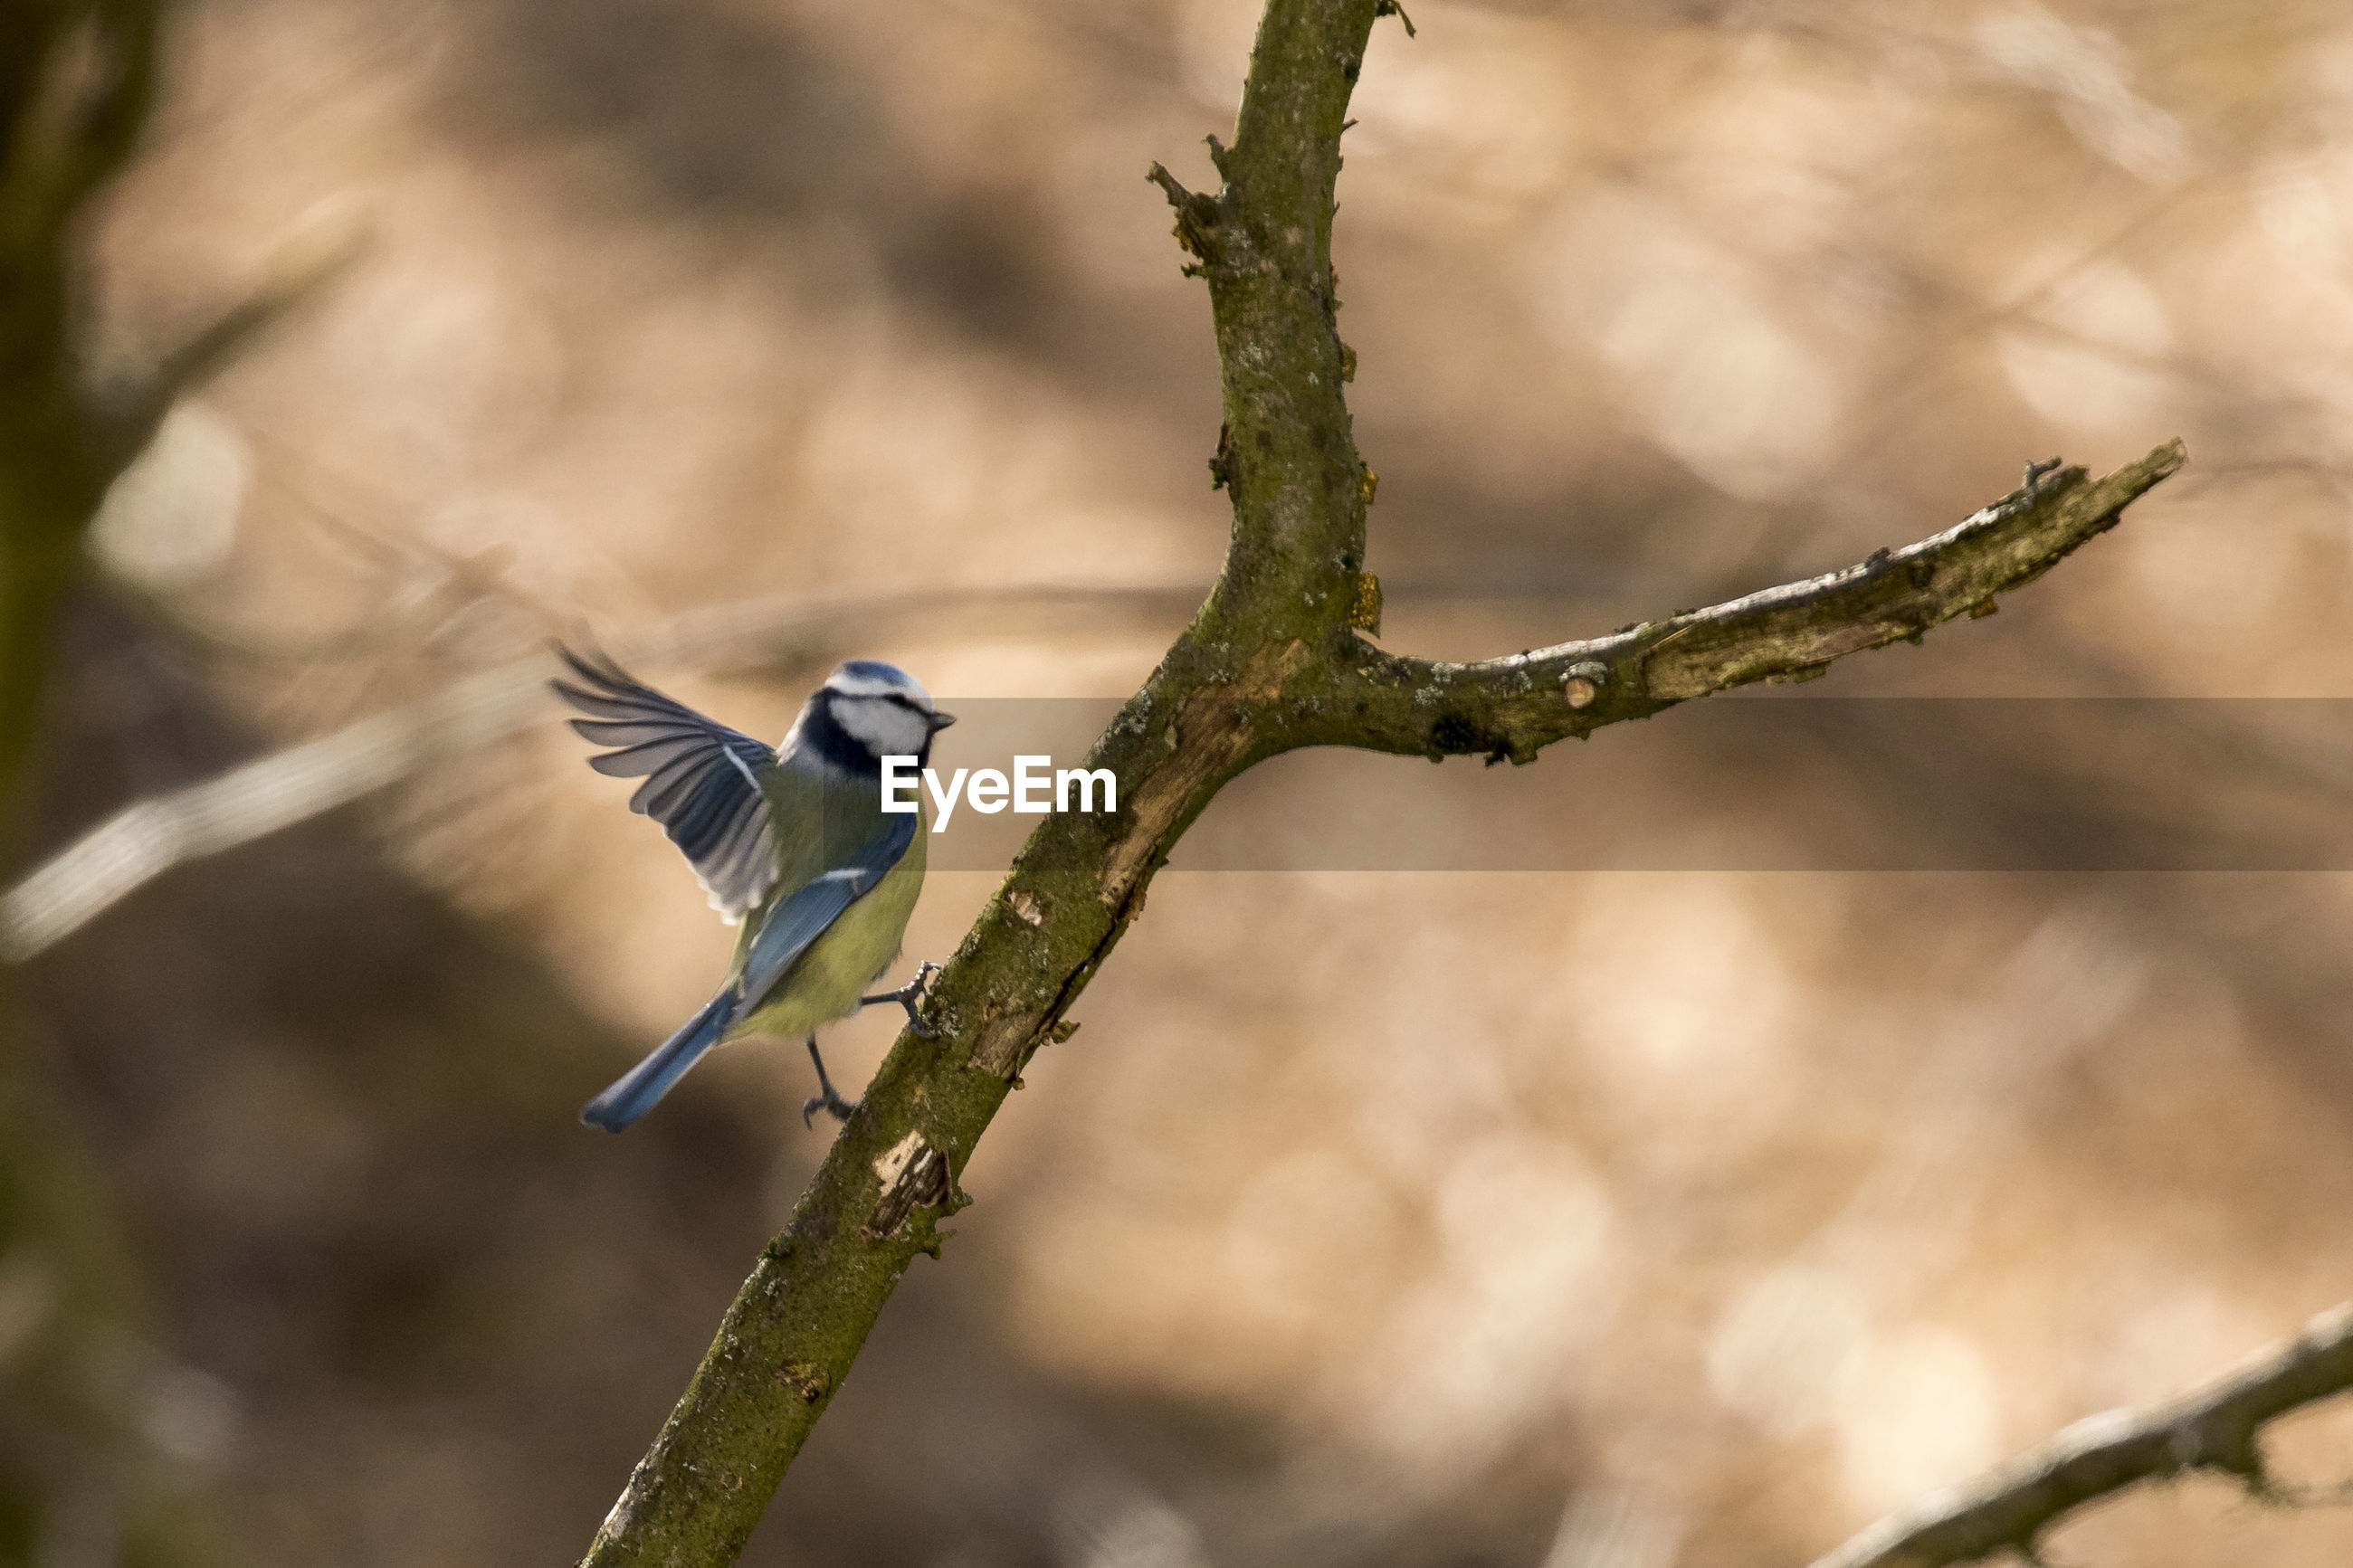 Close-up of bluetit perching on branch